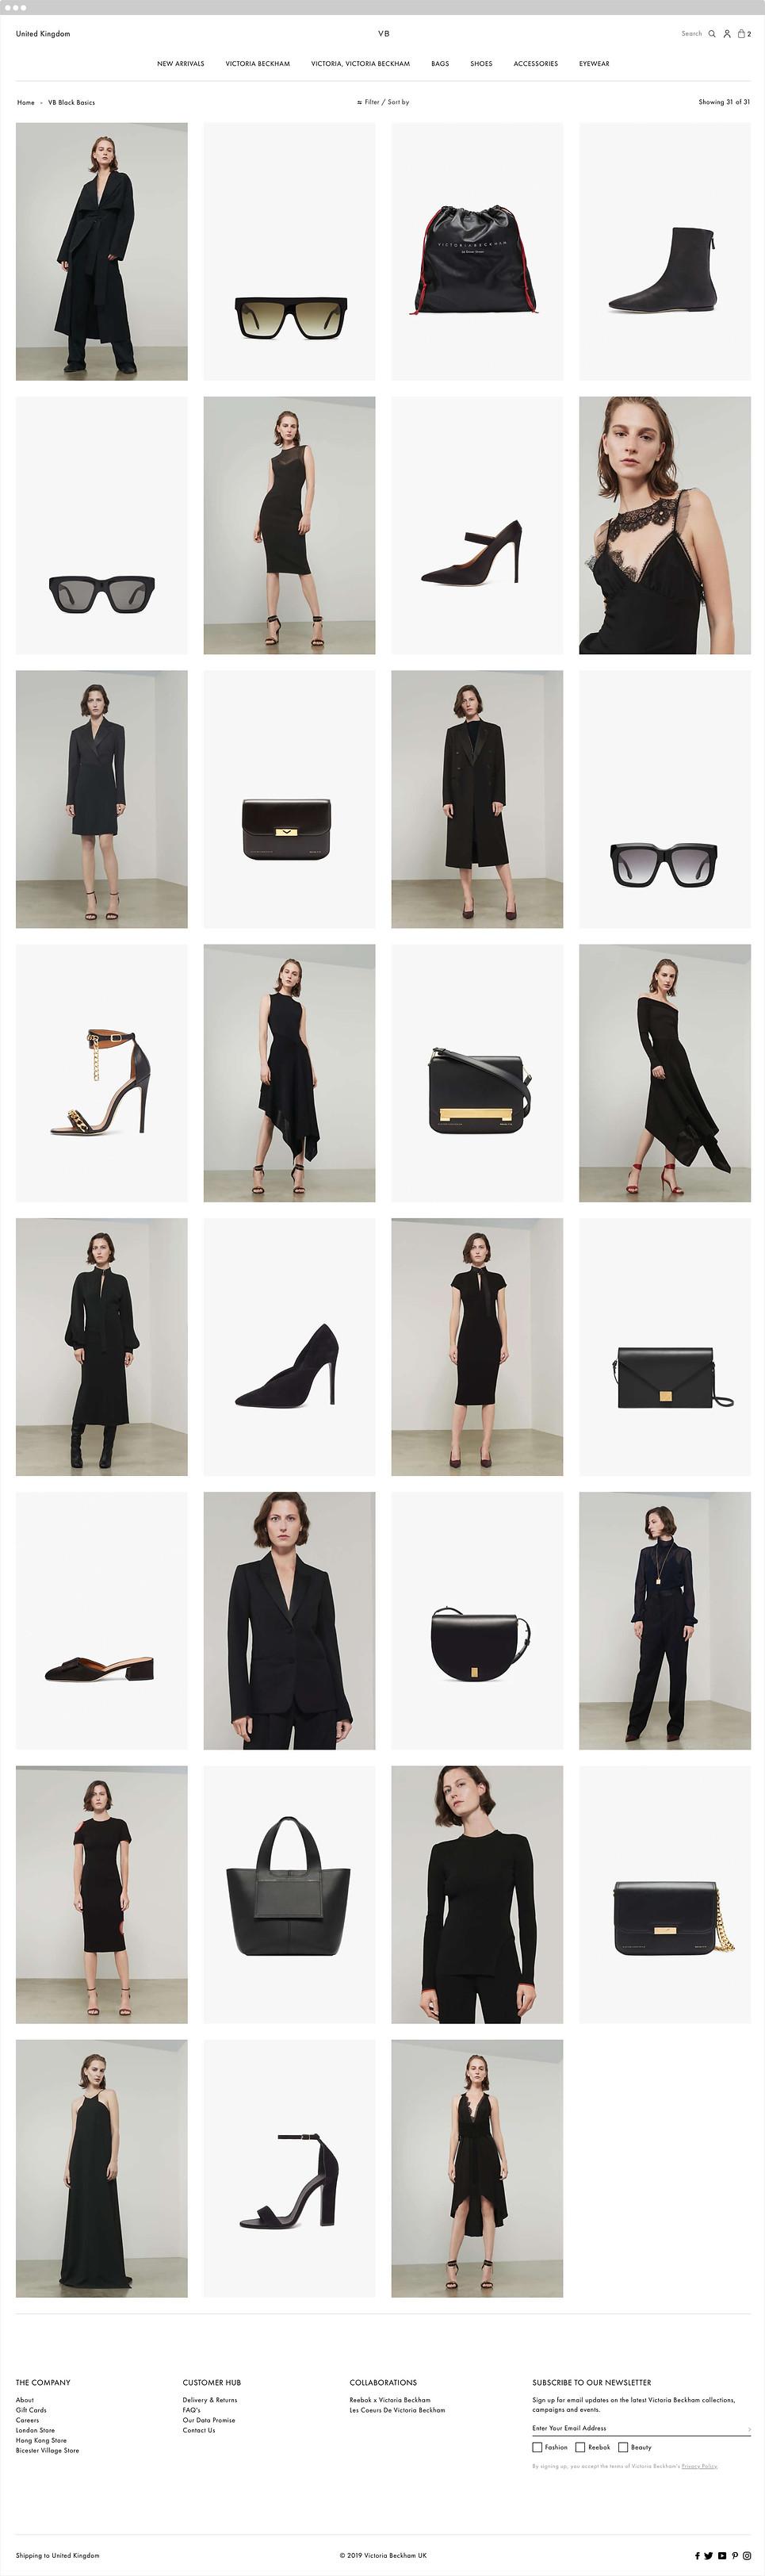 portfolio-victoria-beckham-collection-de